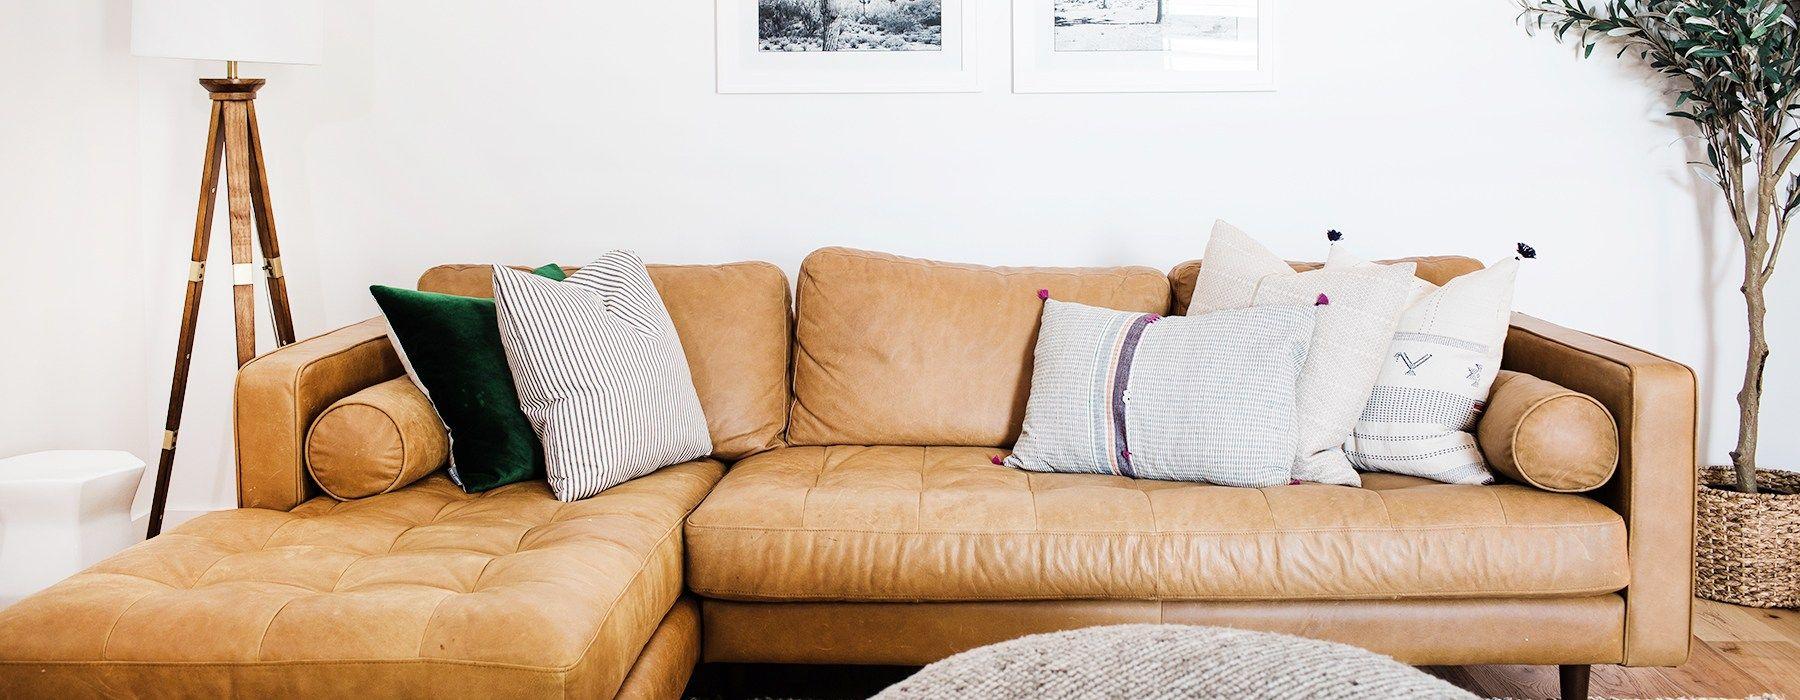 Interior design portfolio popular designers  interiors also in home  decor inspiration pinterest rh